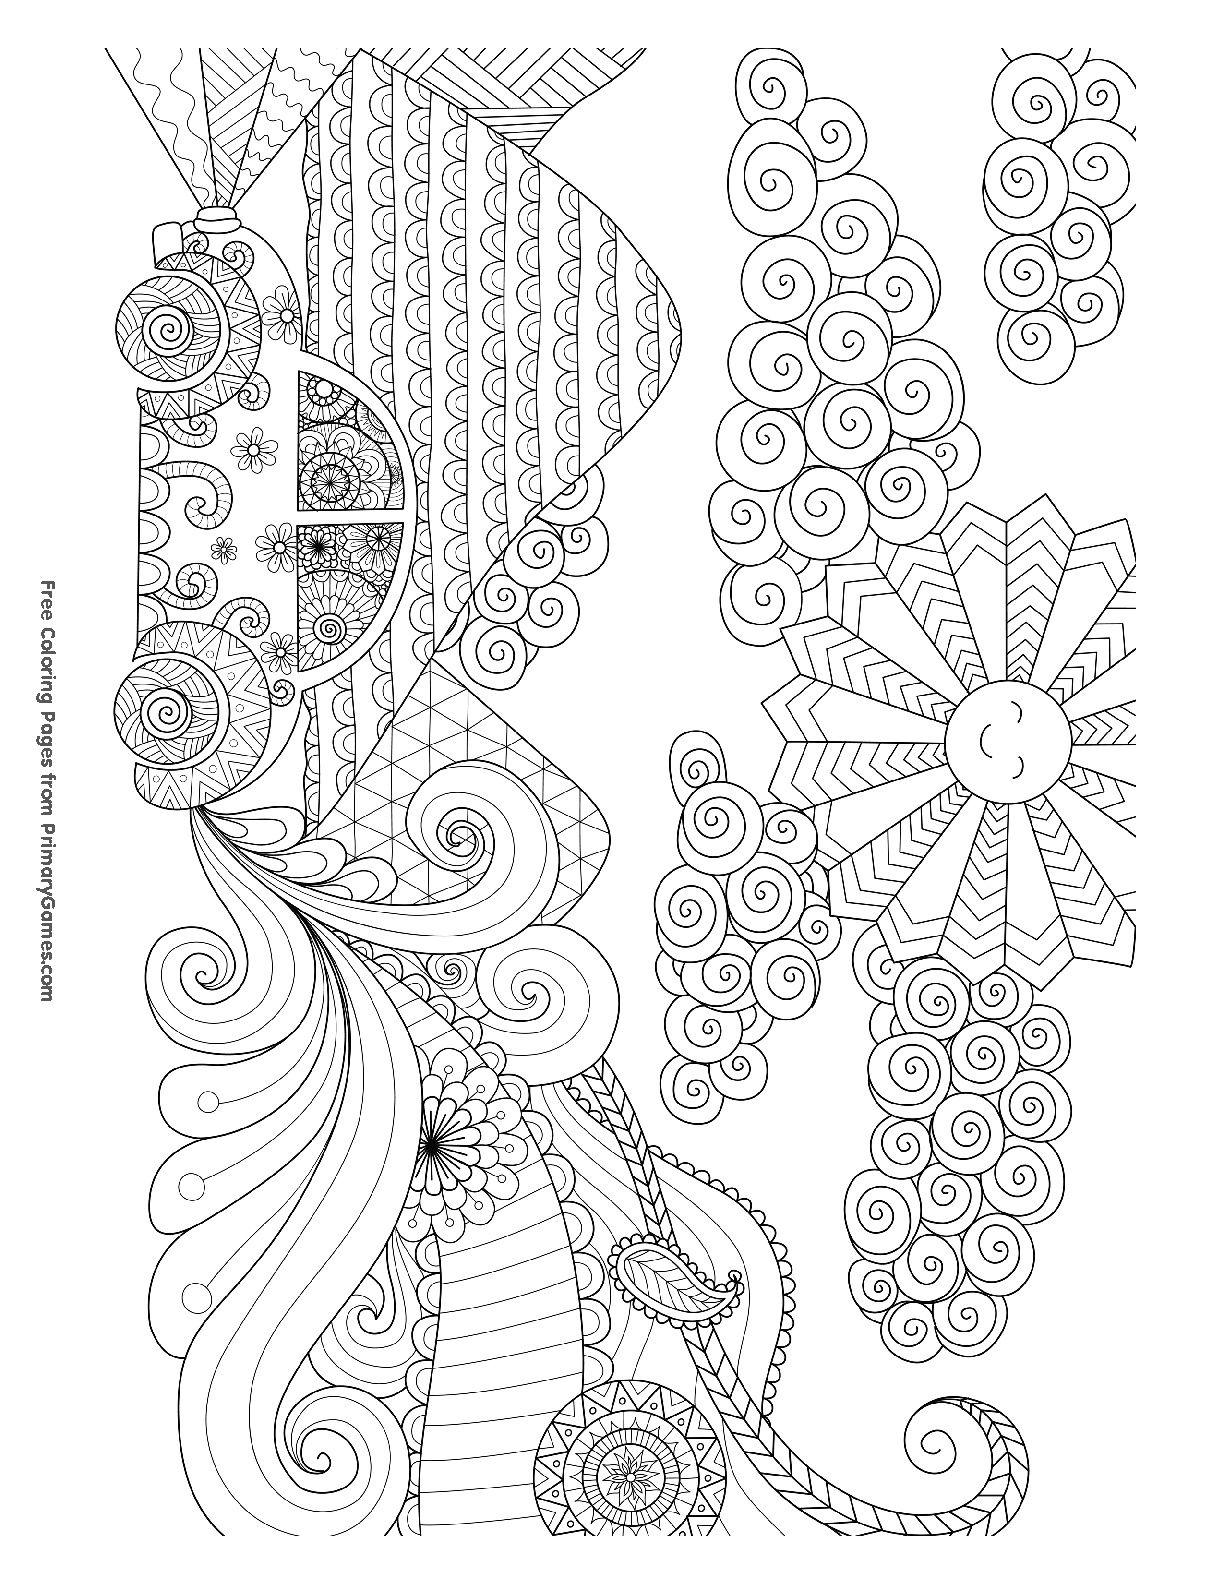 Pin de Катя en Раскраски антистресс | Pinterest